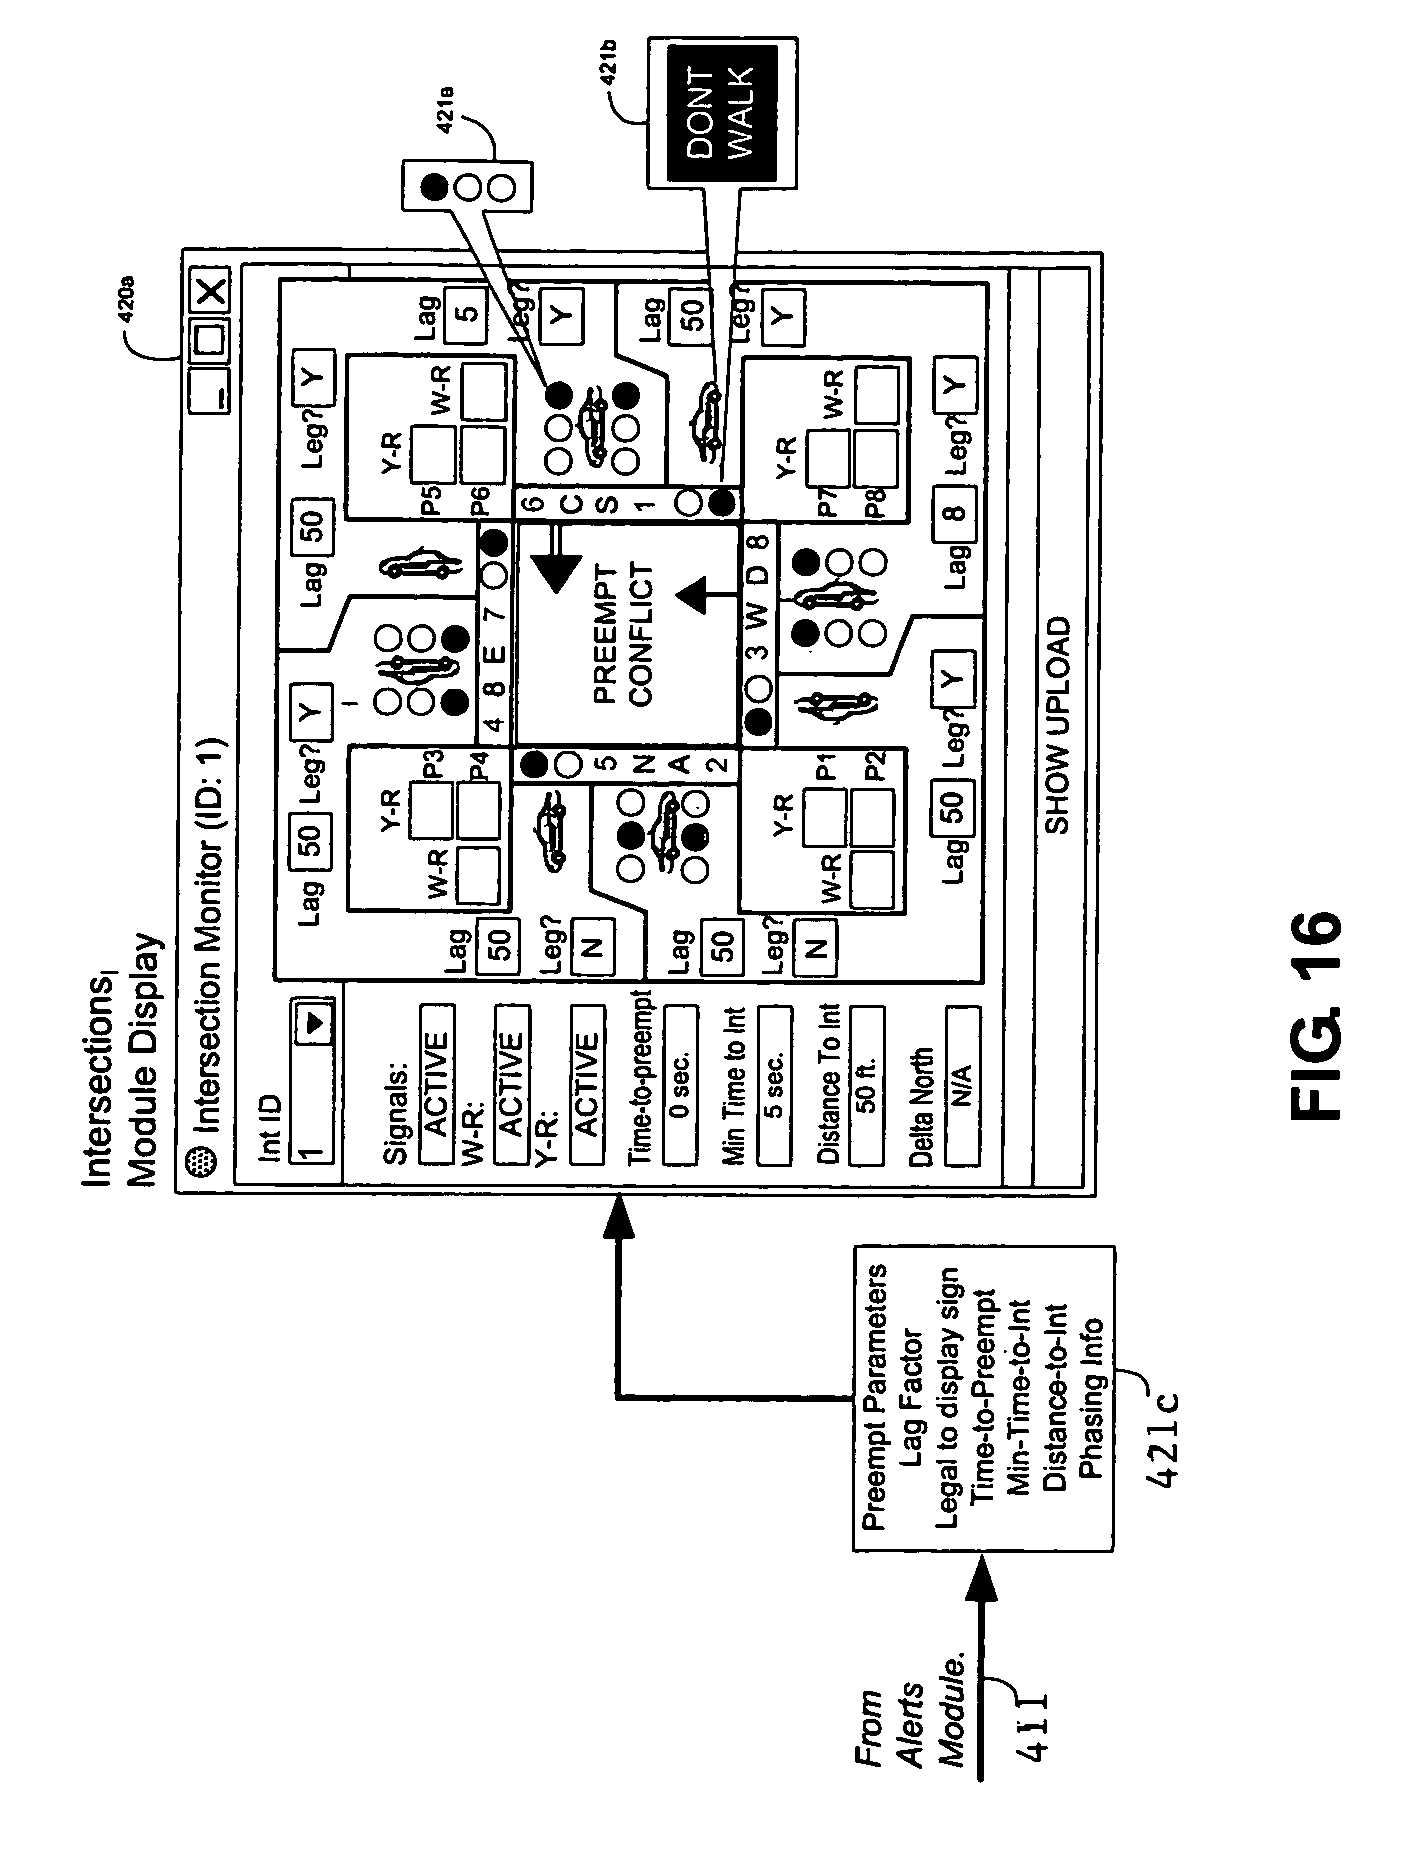 patent us7864071 - emergency vehicle traffic signal preemption system